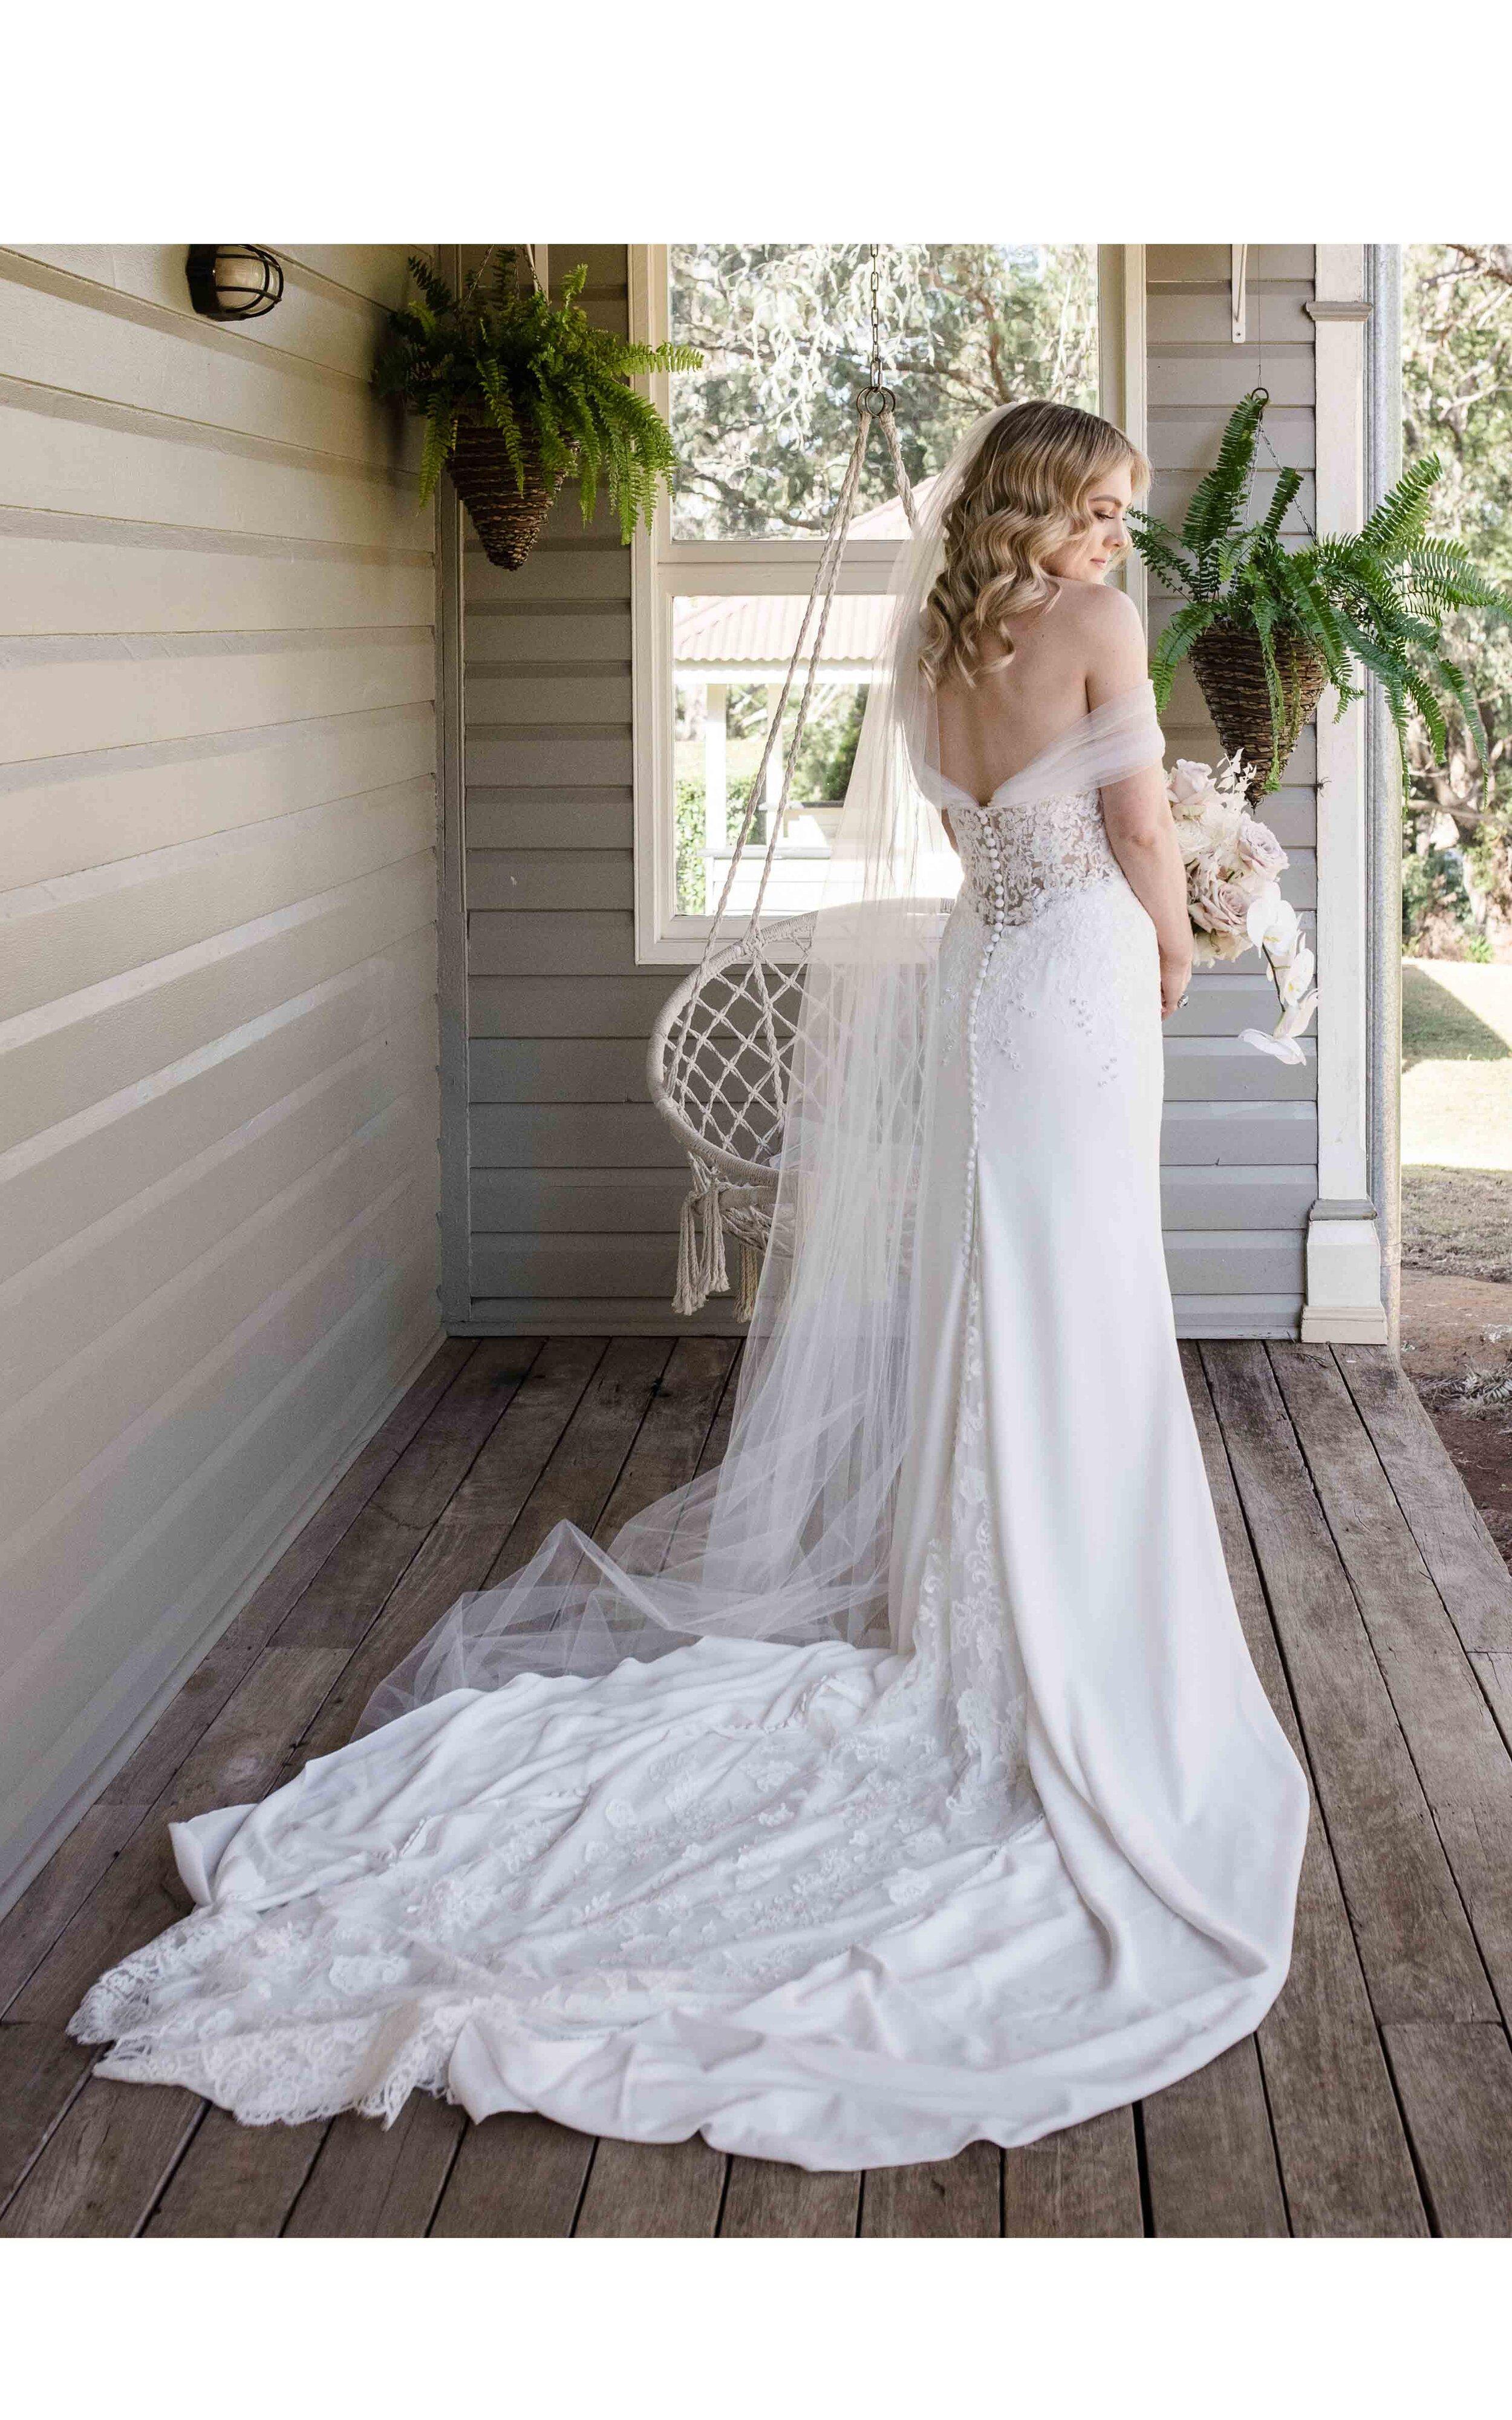 Gabbinbar Homestead Wedding Emily and Luke30.jpg